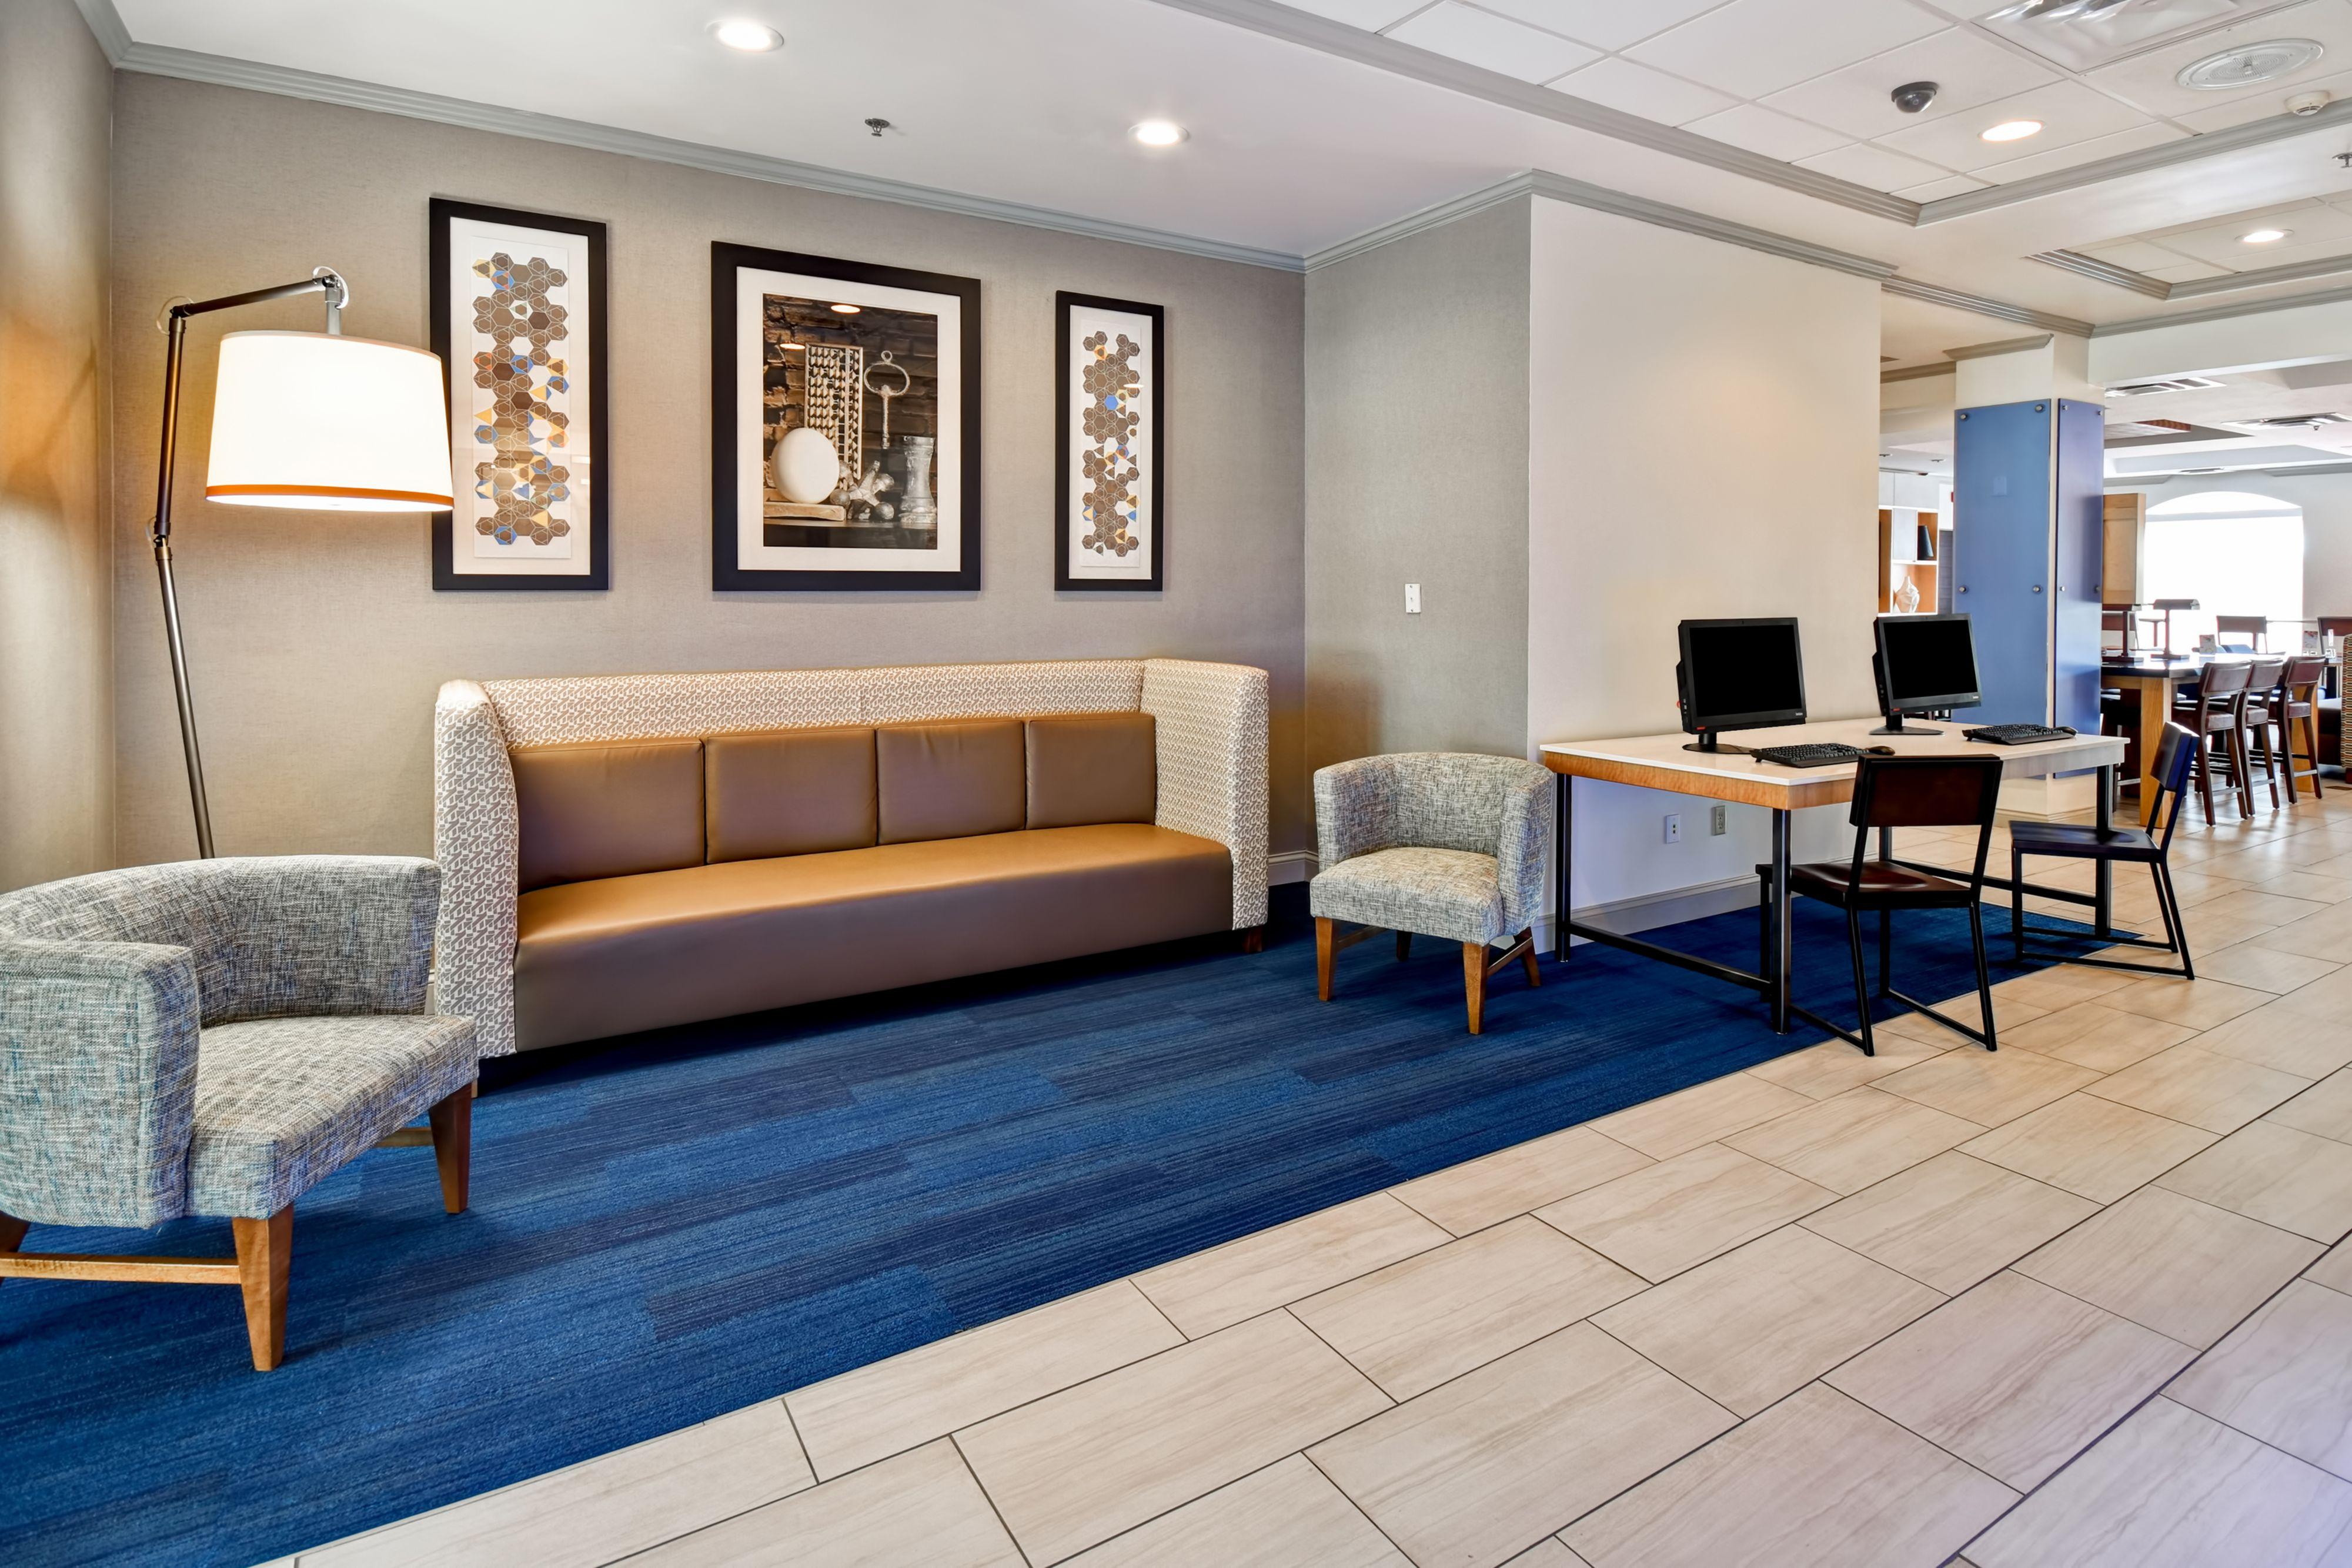 Holiday Inn Express & Suites Schererville in Schererville ...